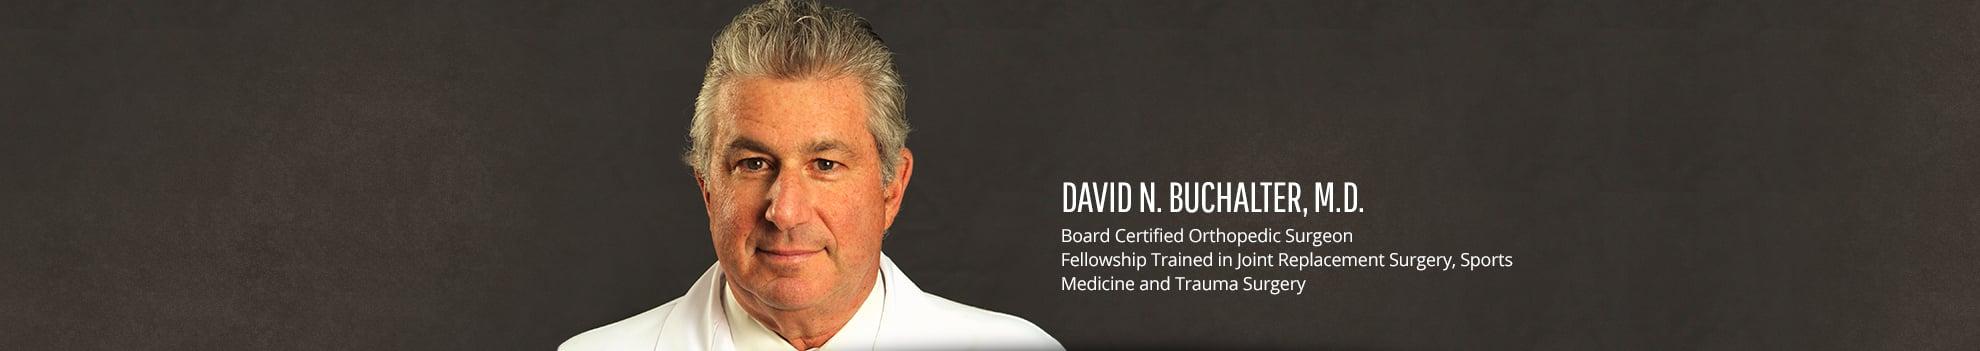 Dr. David N Buchalter MD